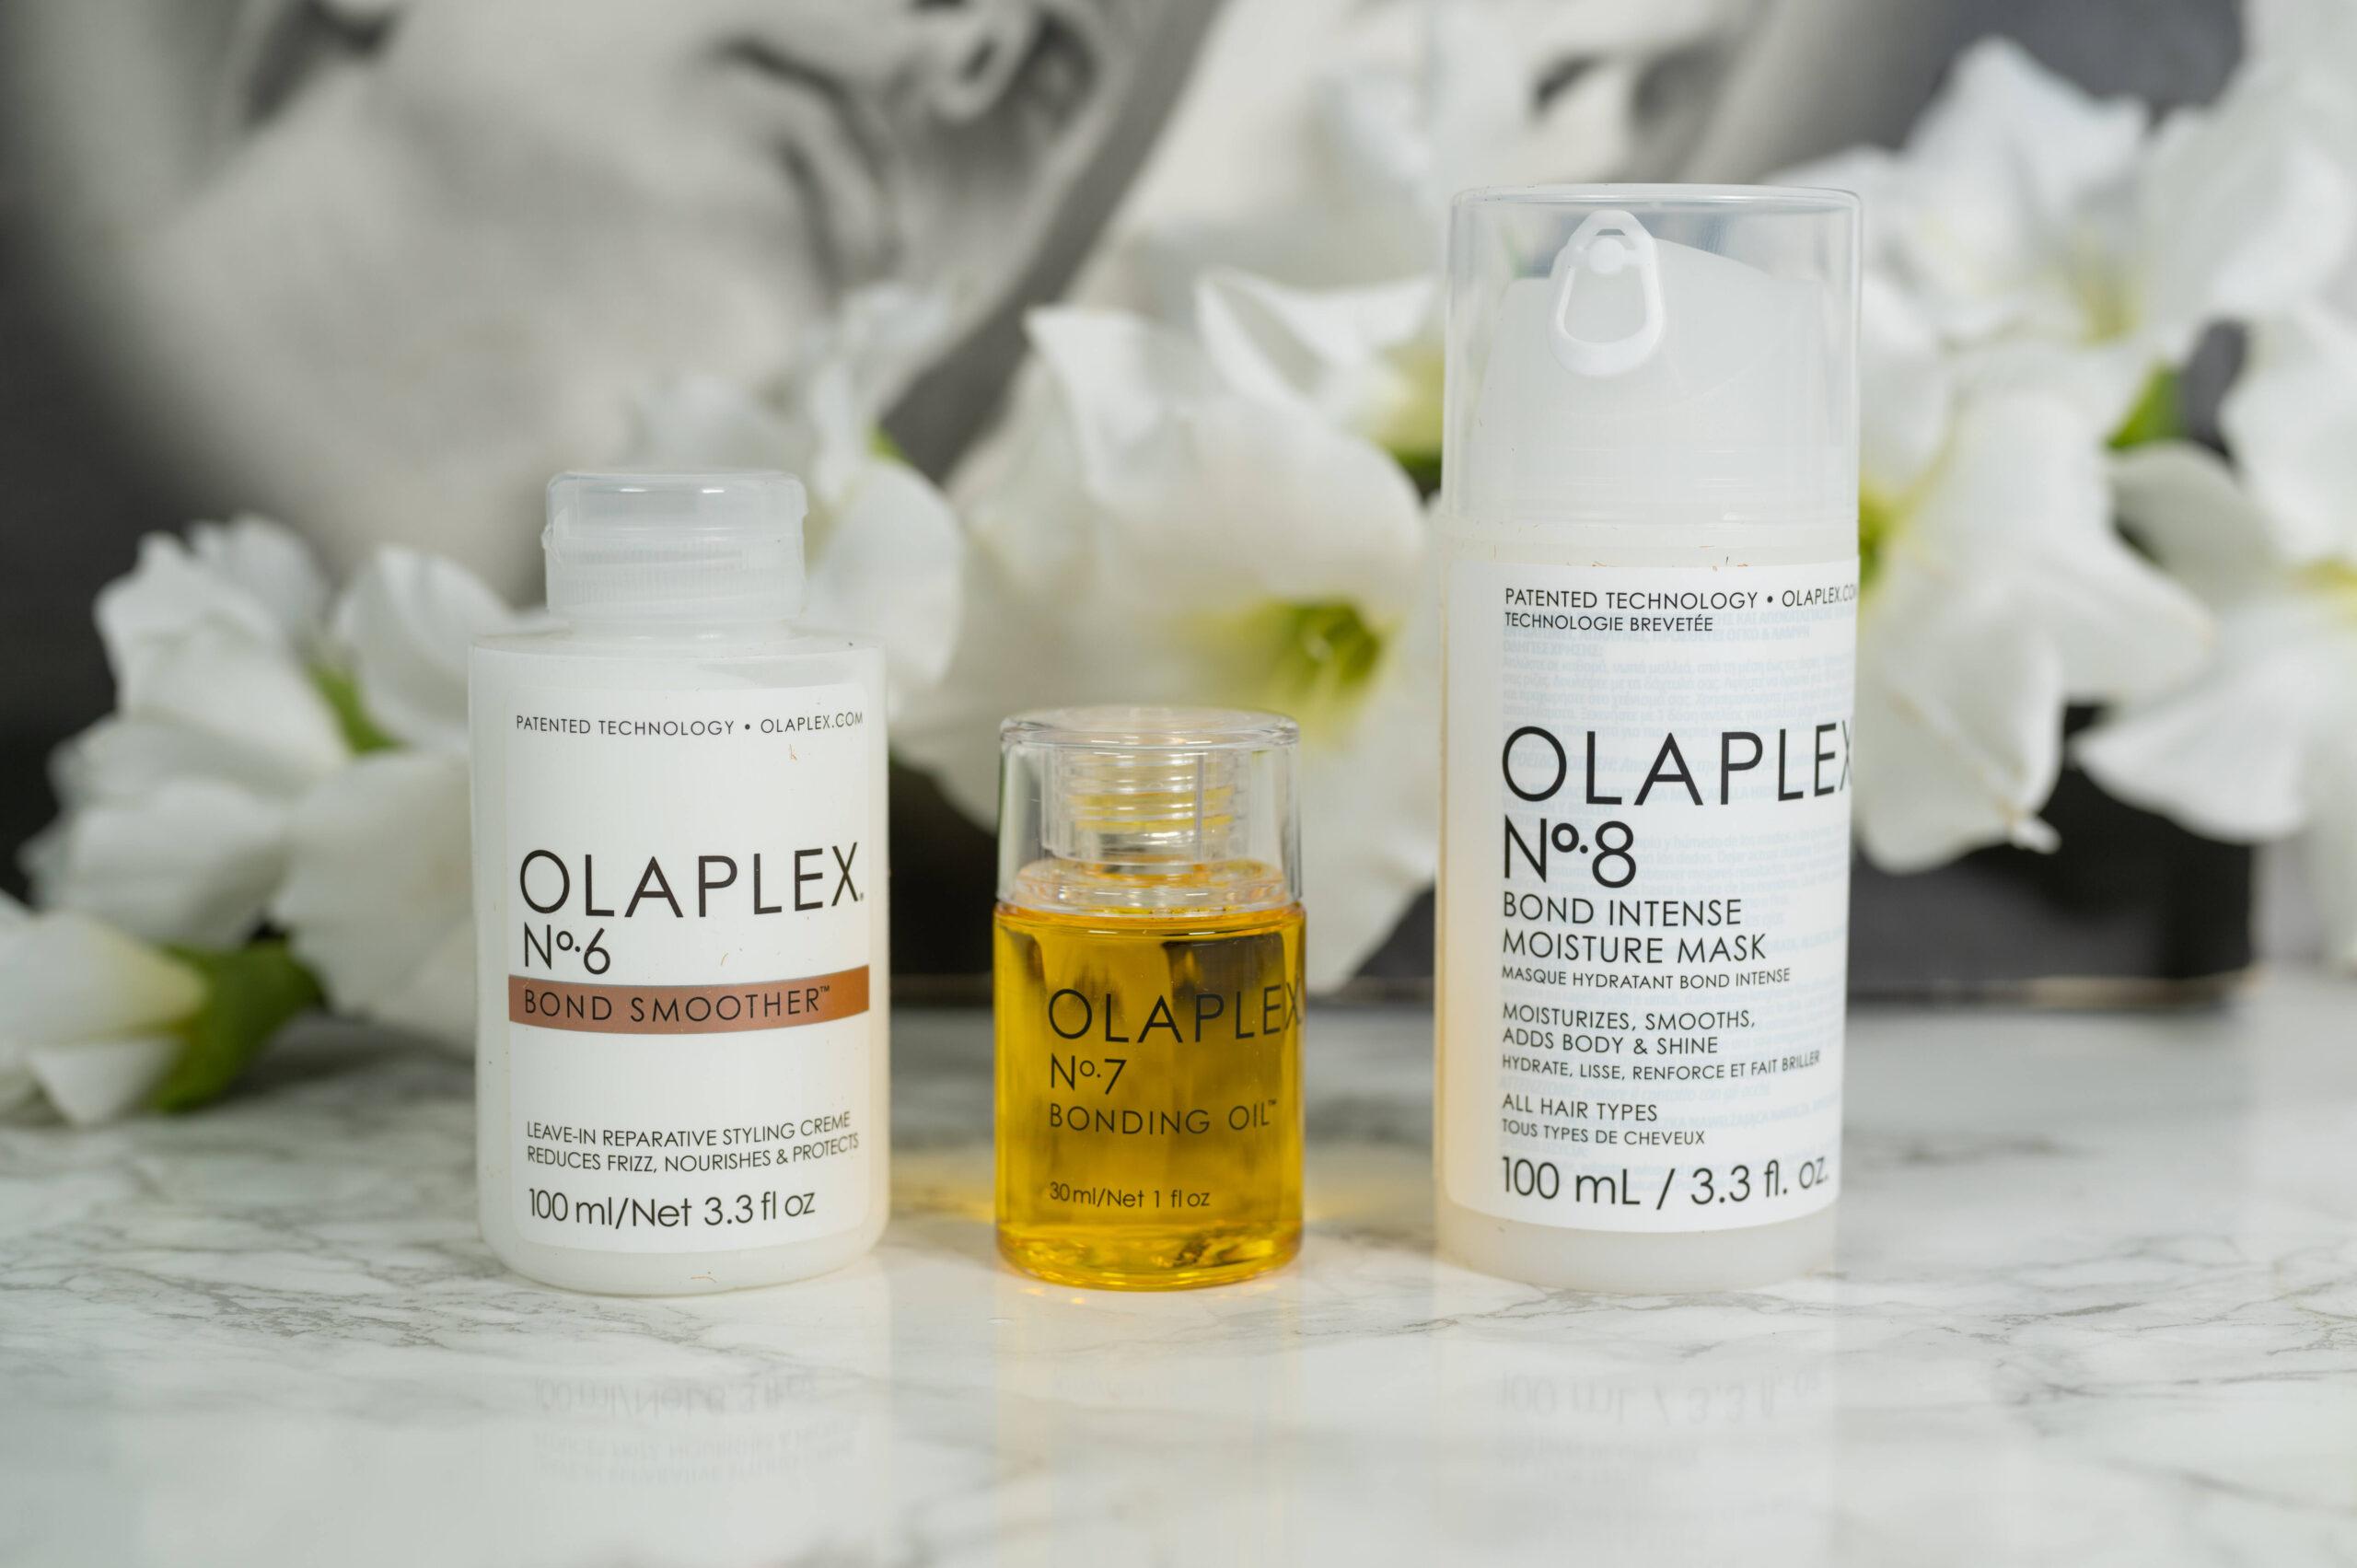 New in from Olaplex